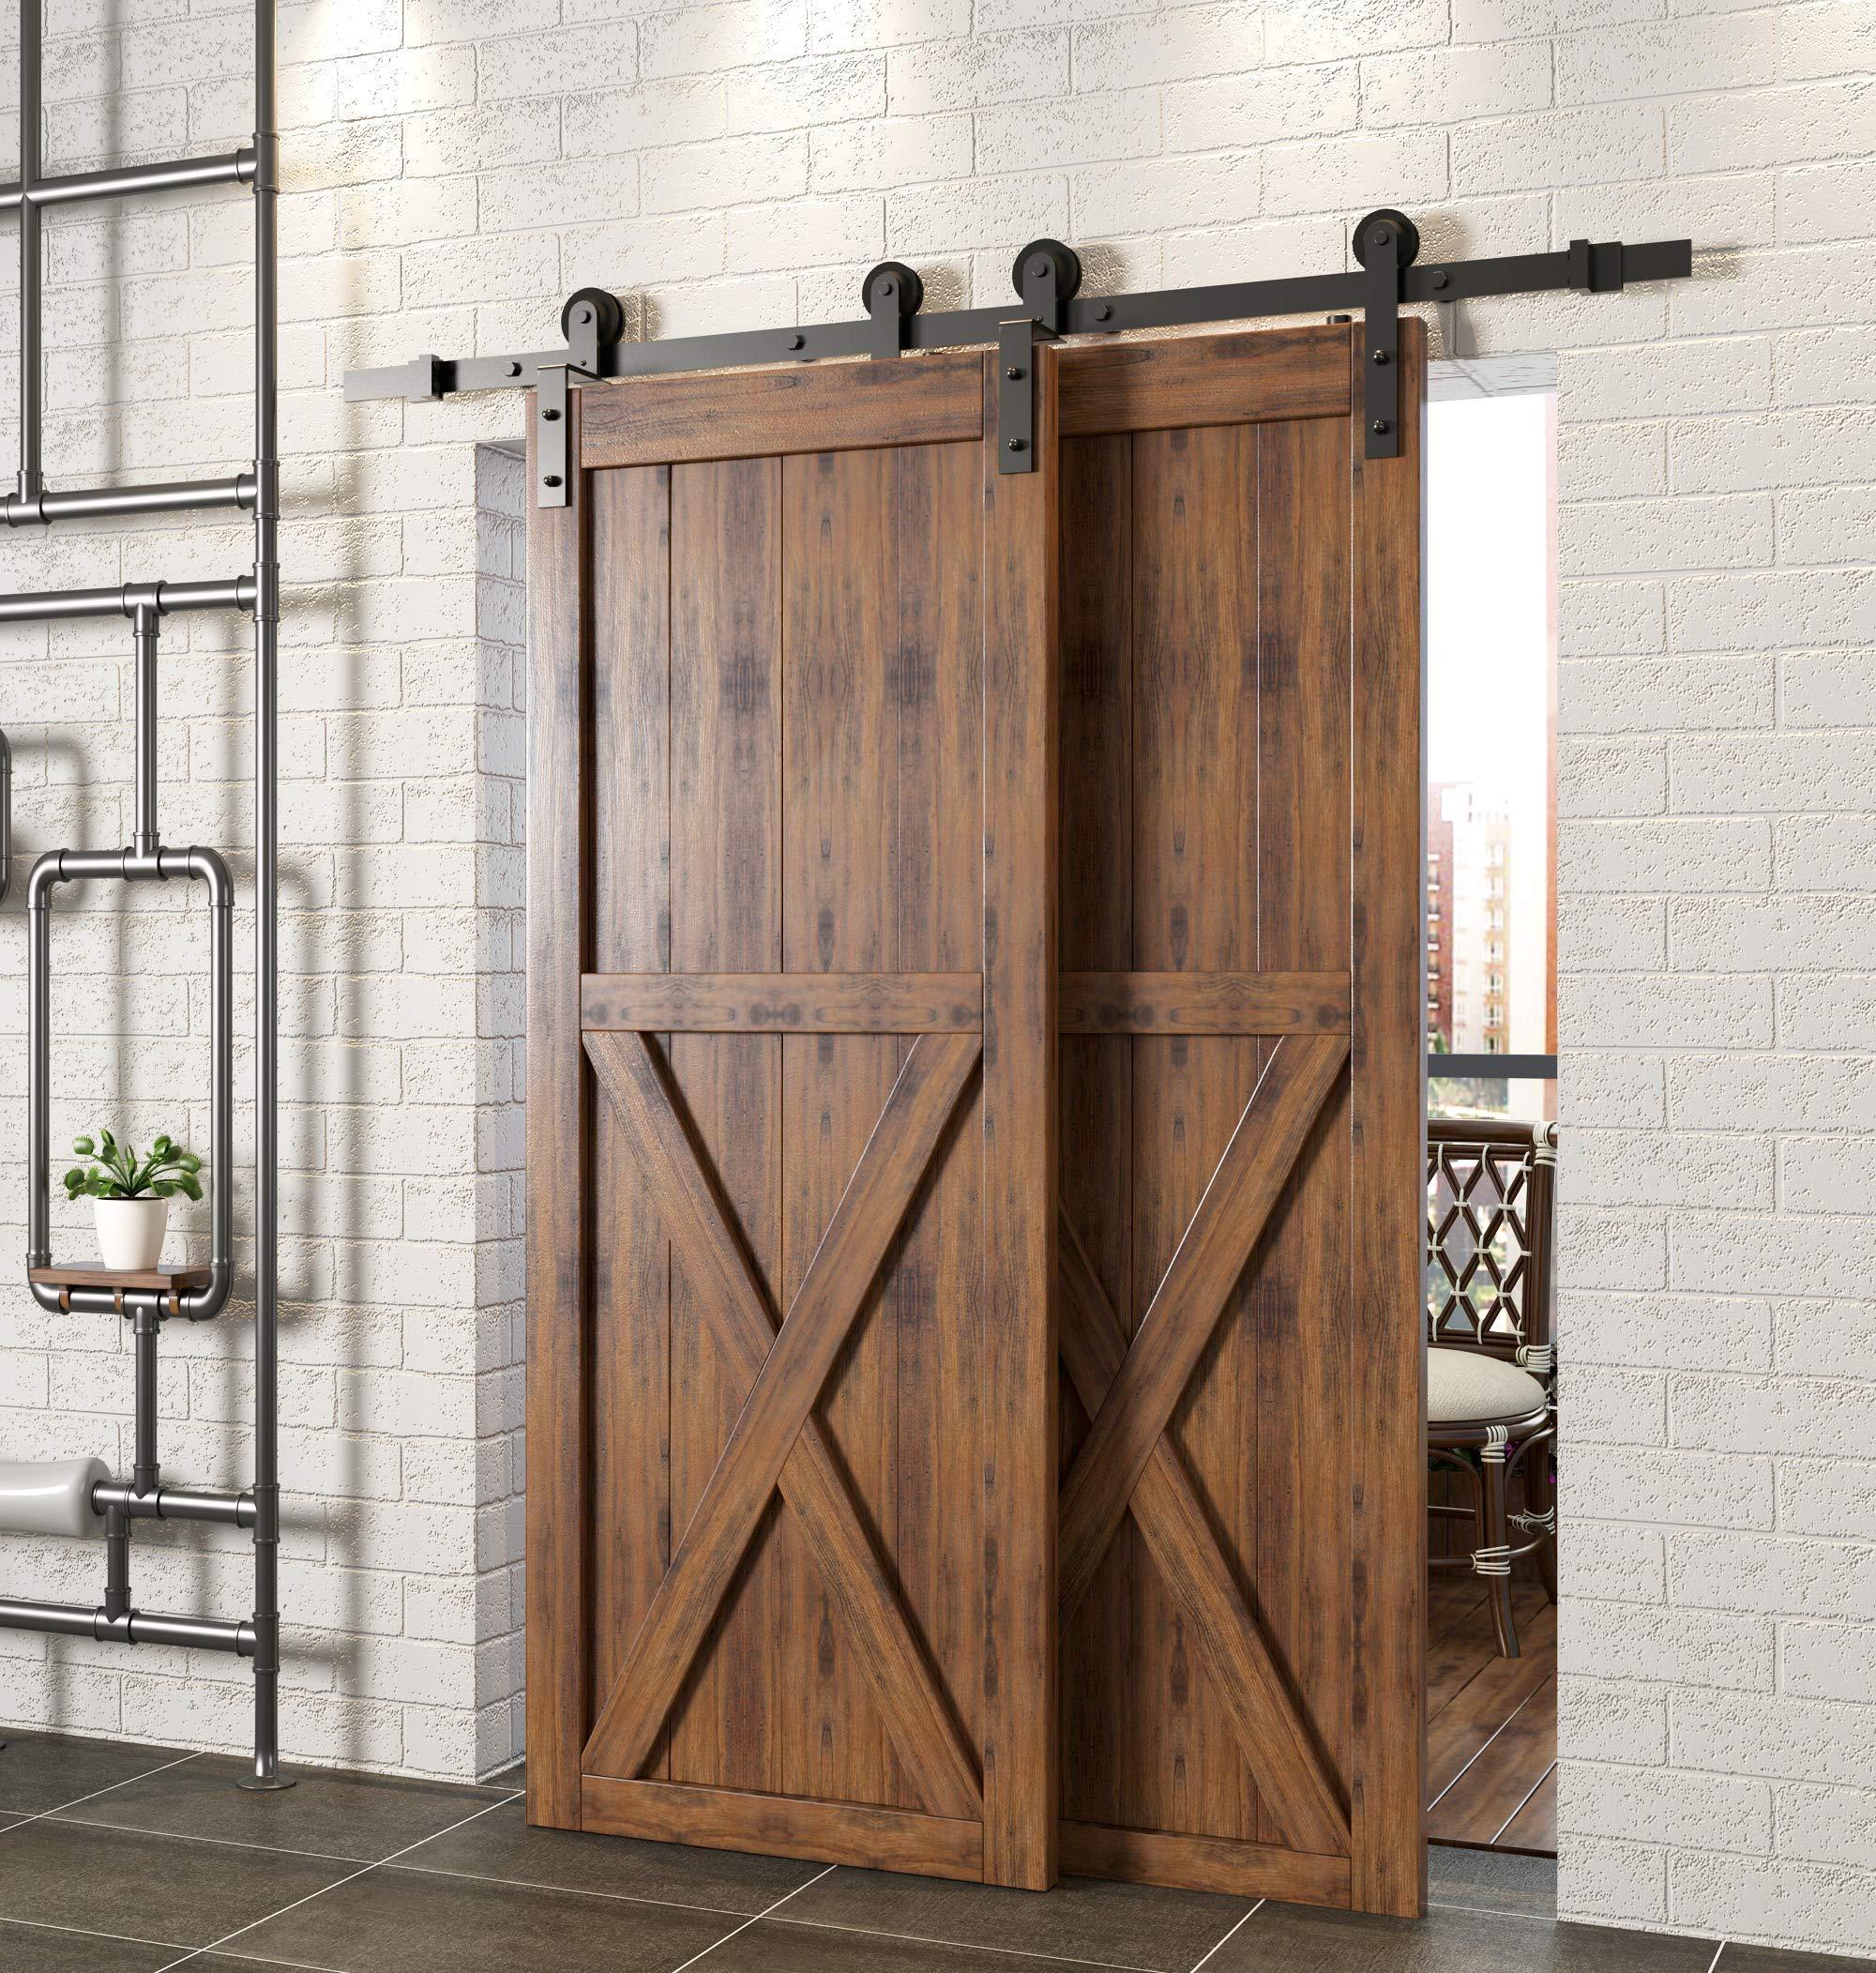 Homacer kit de puerta corredera de granero de doble puerta, 4 pies ...